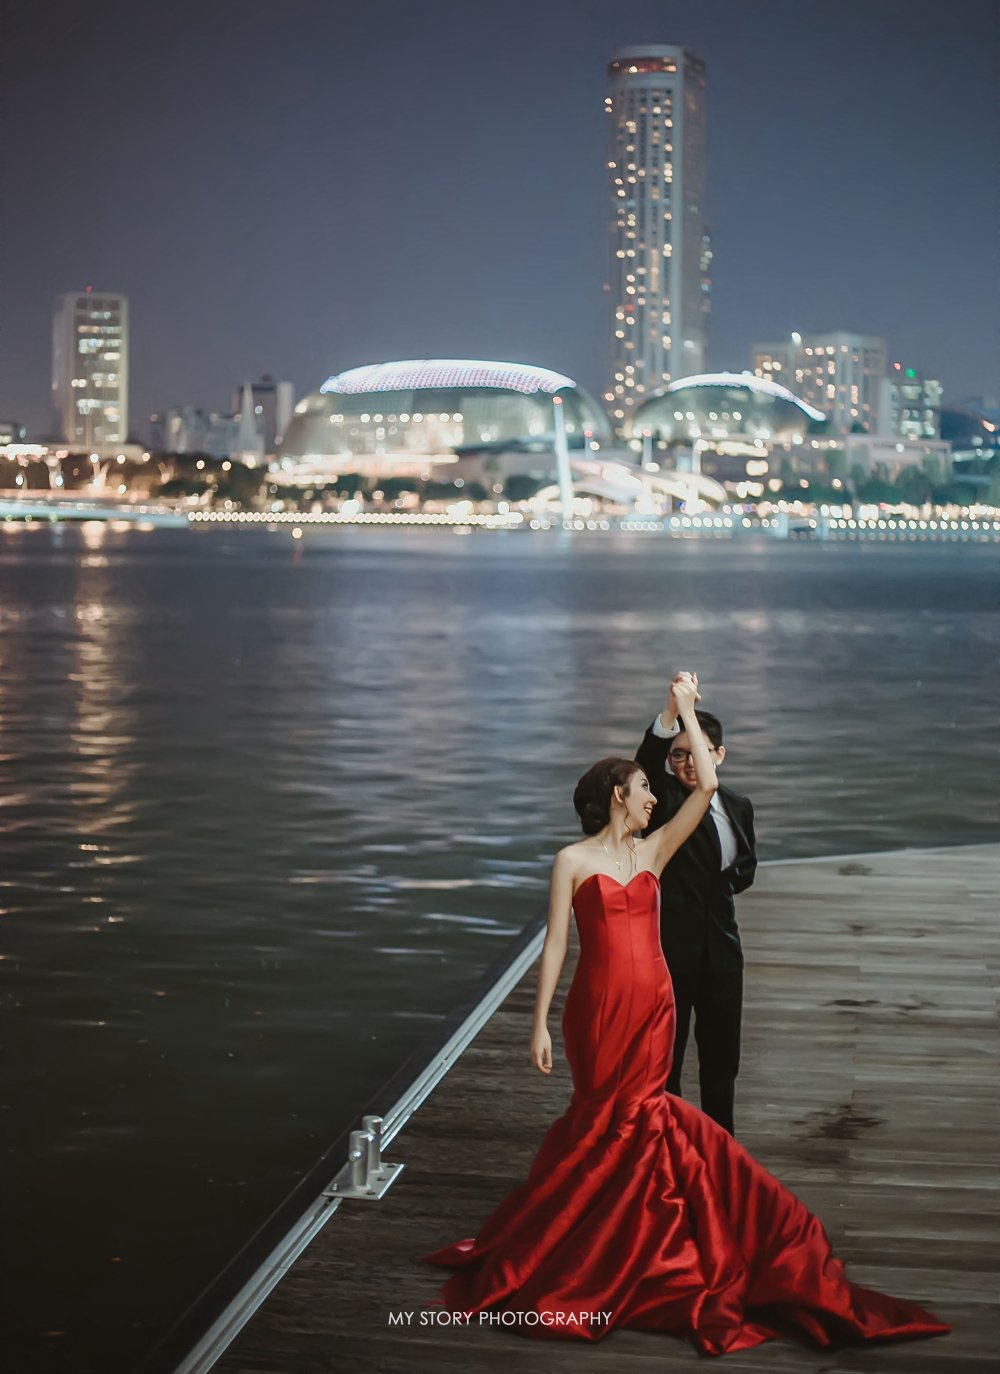 my story photography video fotografi pernikahan